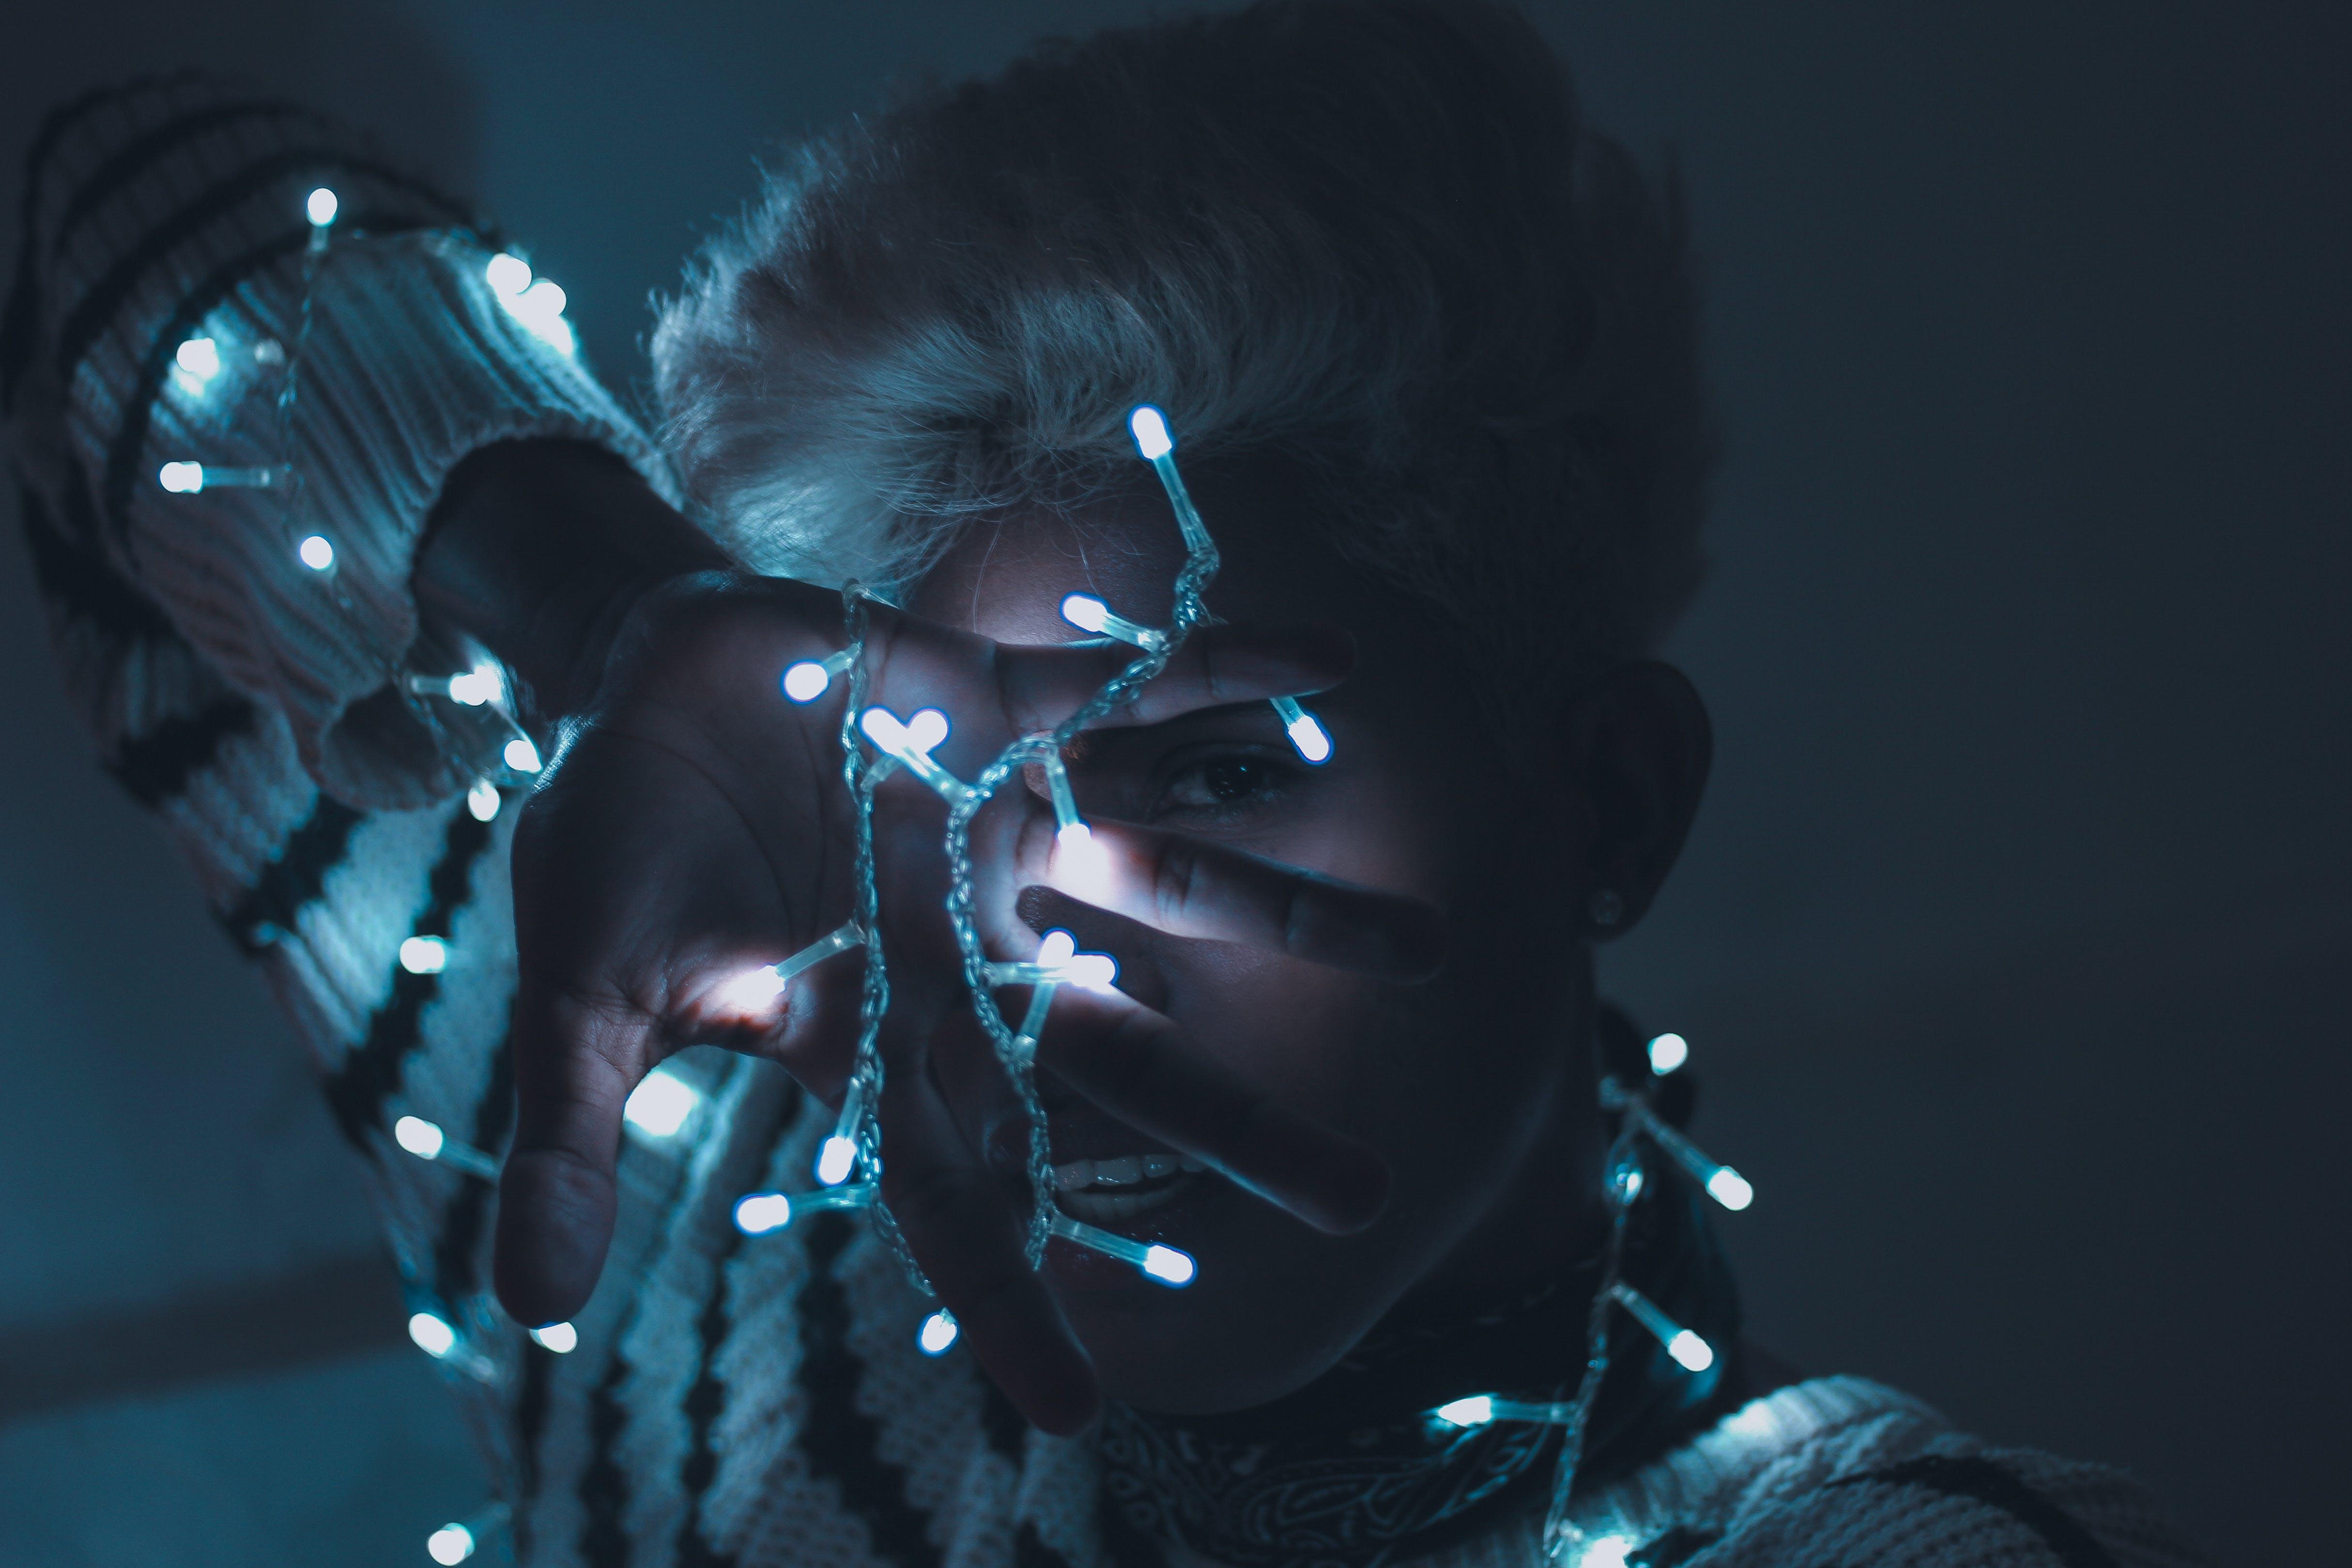 Kostenloses Stock Foto zu beleuchtet, beleuchtung, frau, lichterketten